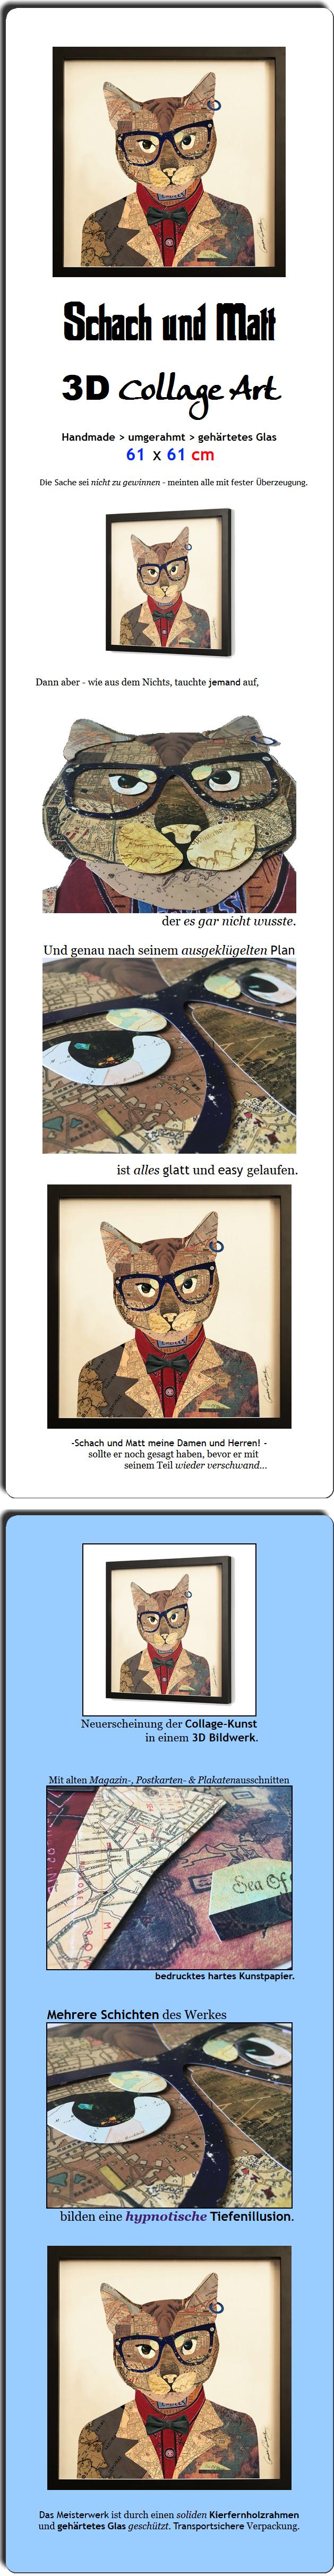 http://roogu.com/auction/OKotAU.png